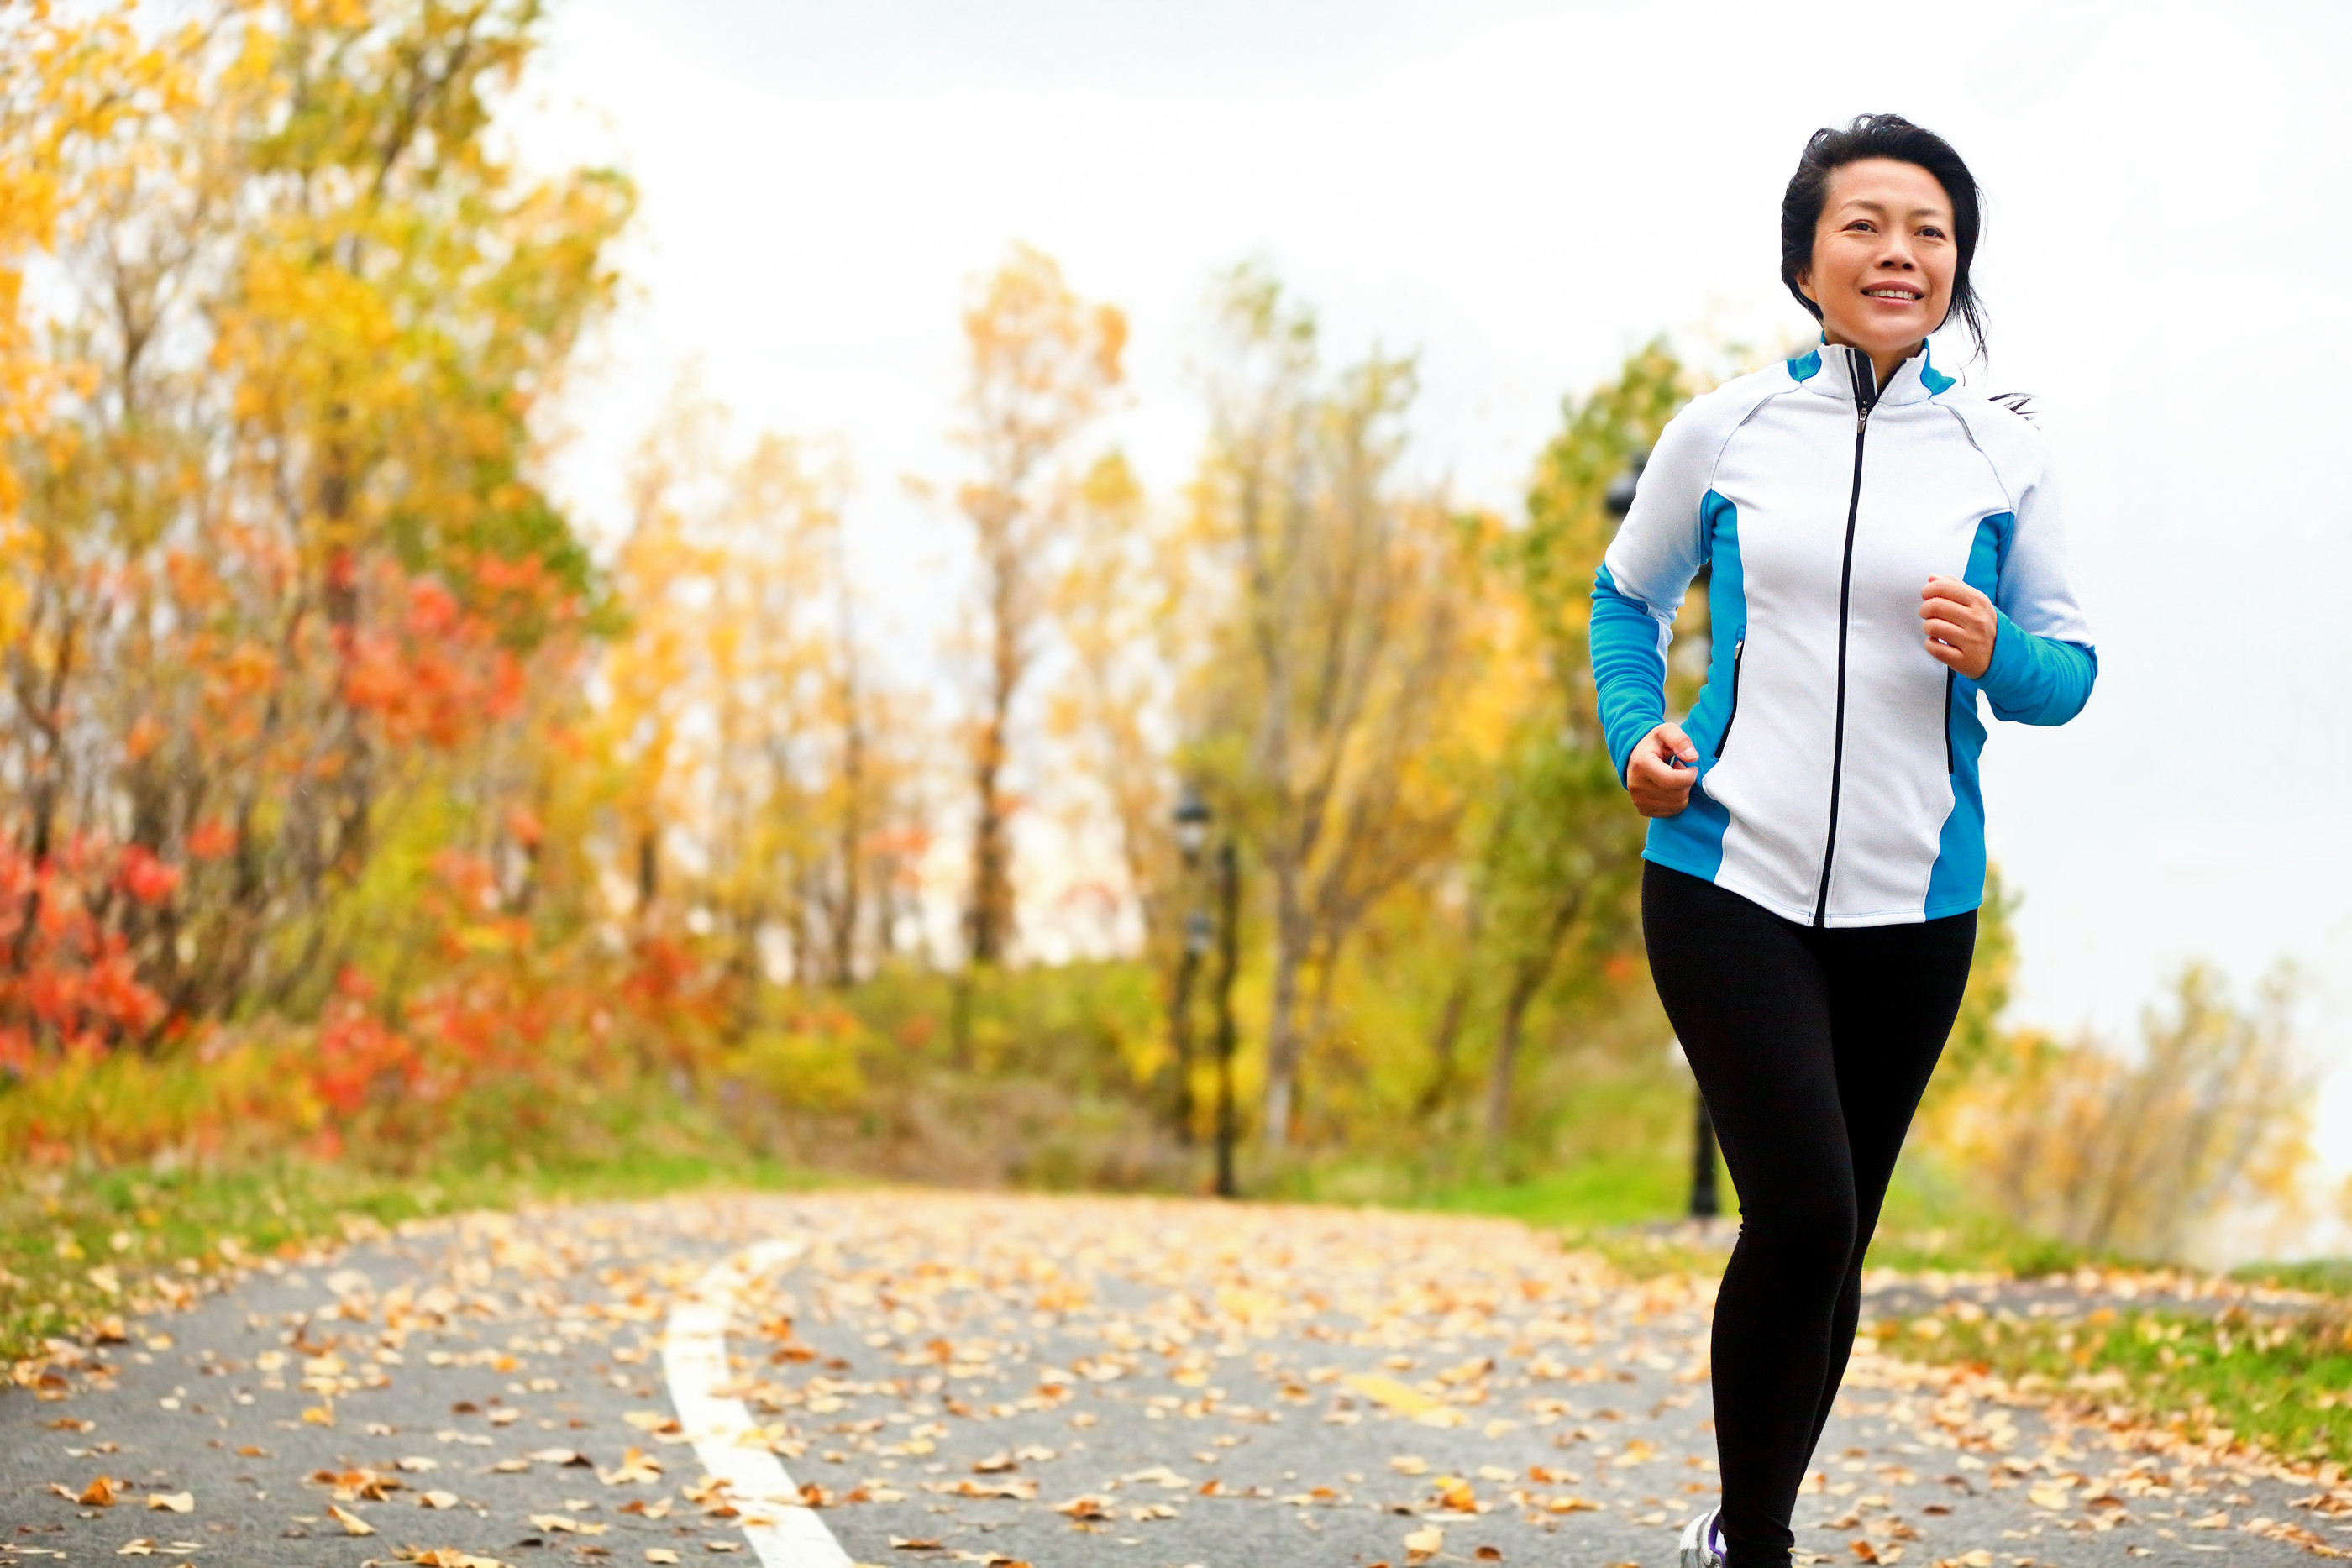 bigstock-Mature-Asian-woman-running-act-48848396